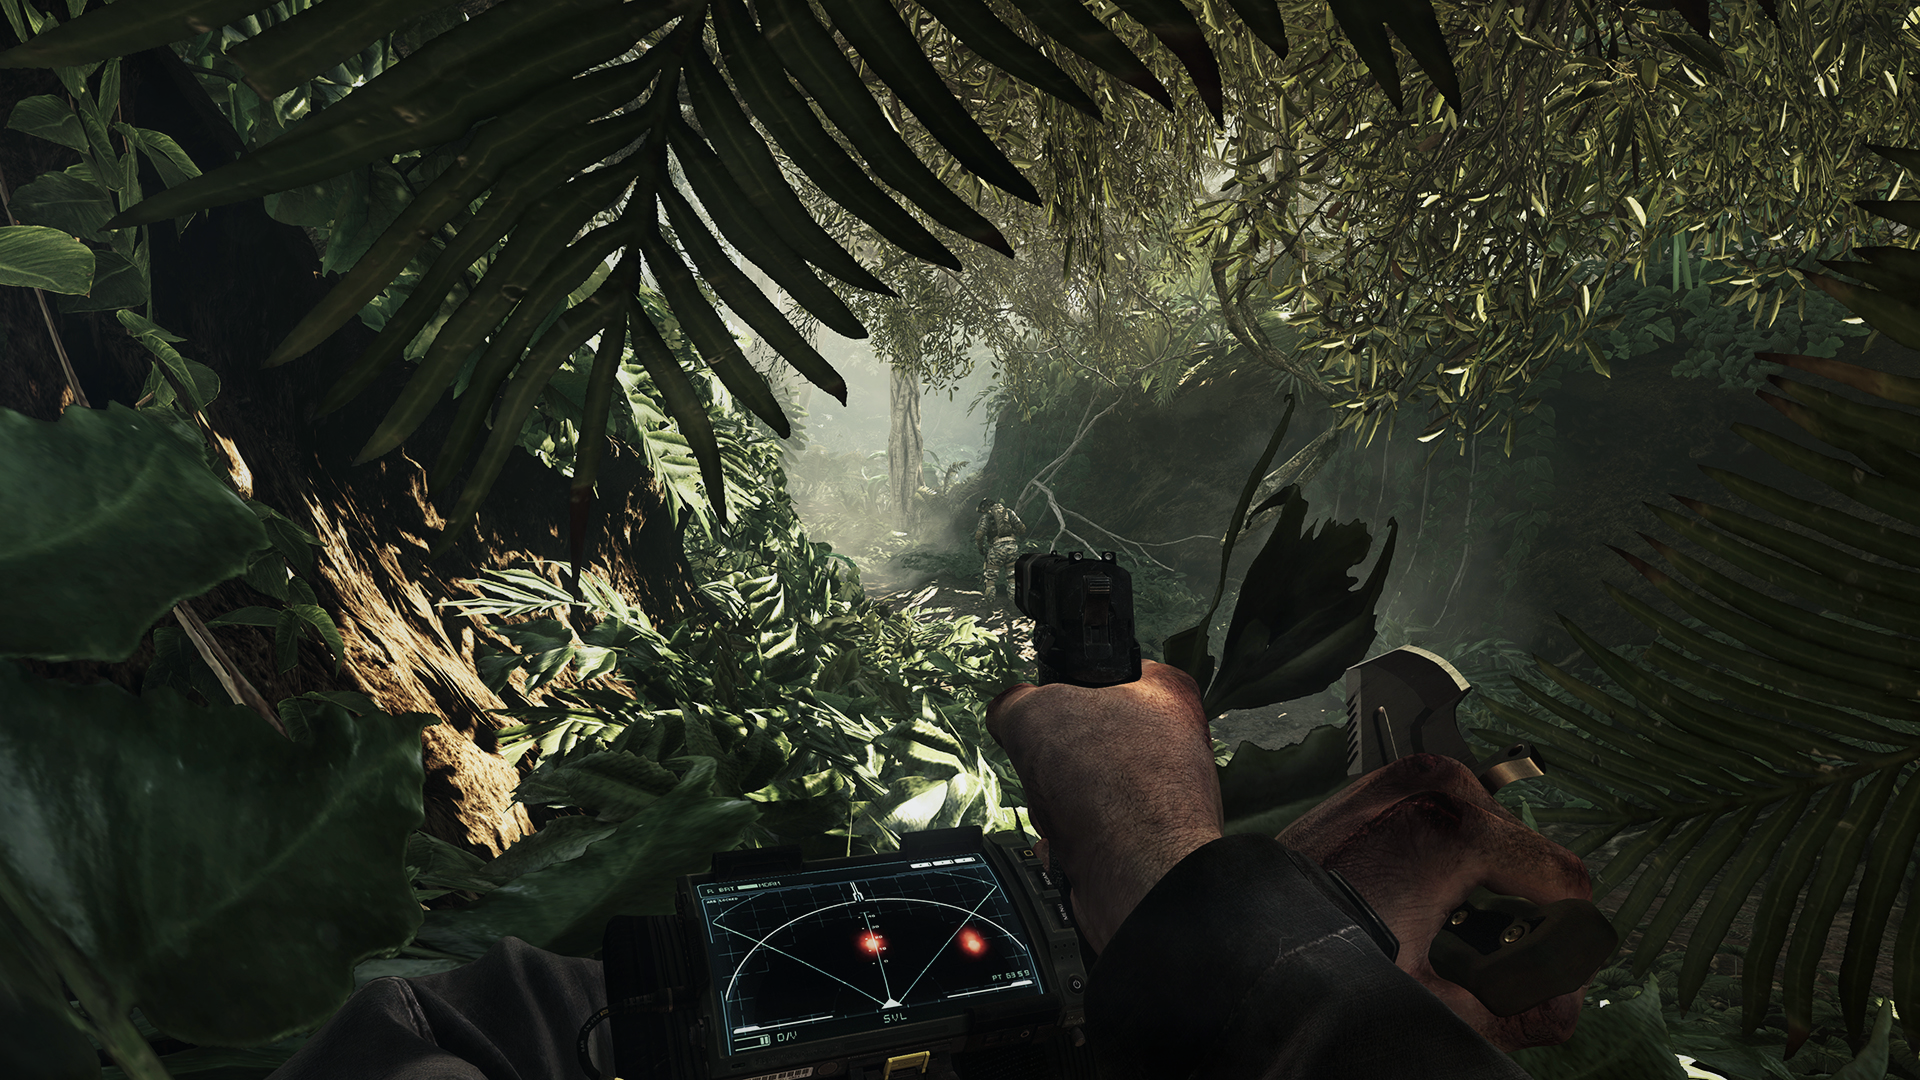 Jungle Ghosts